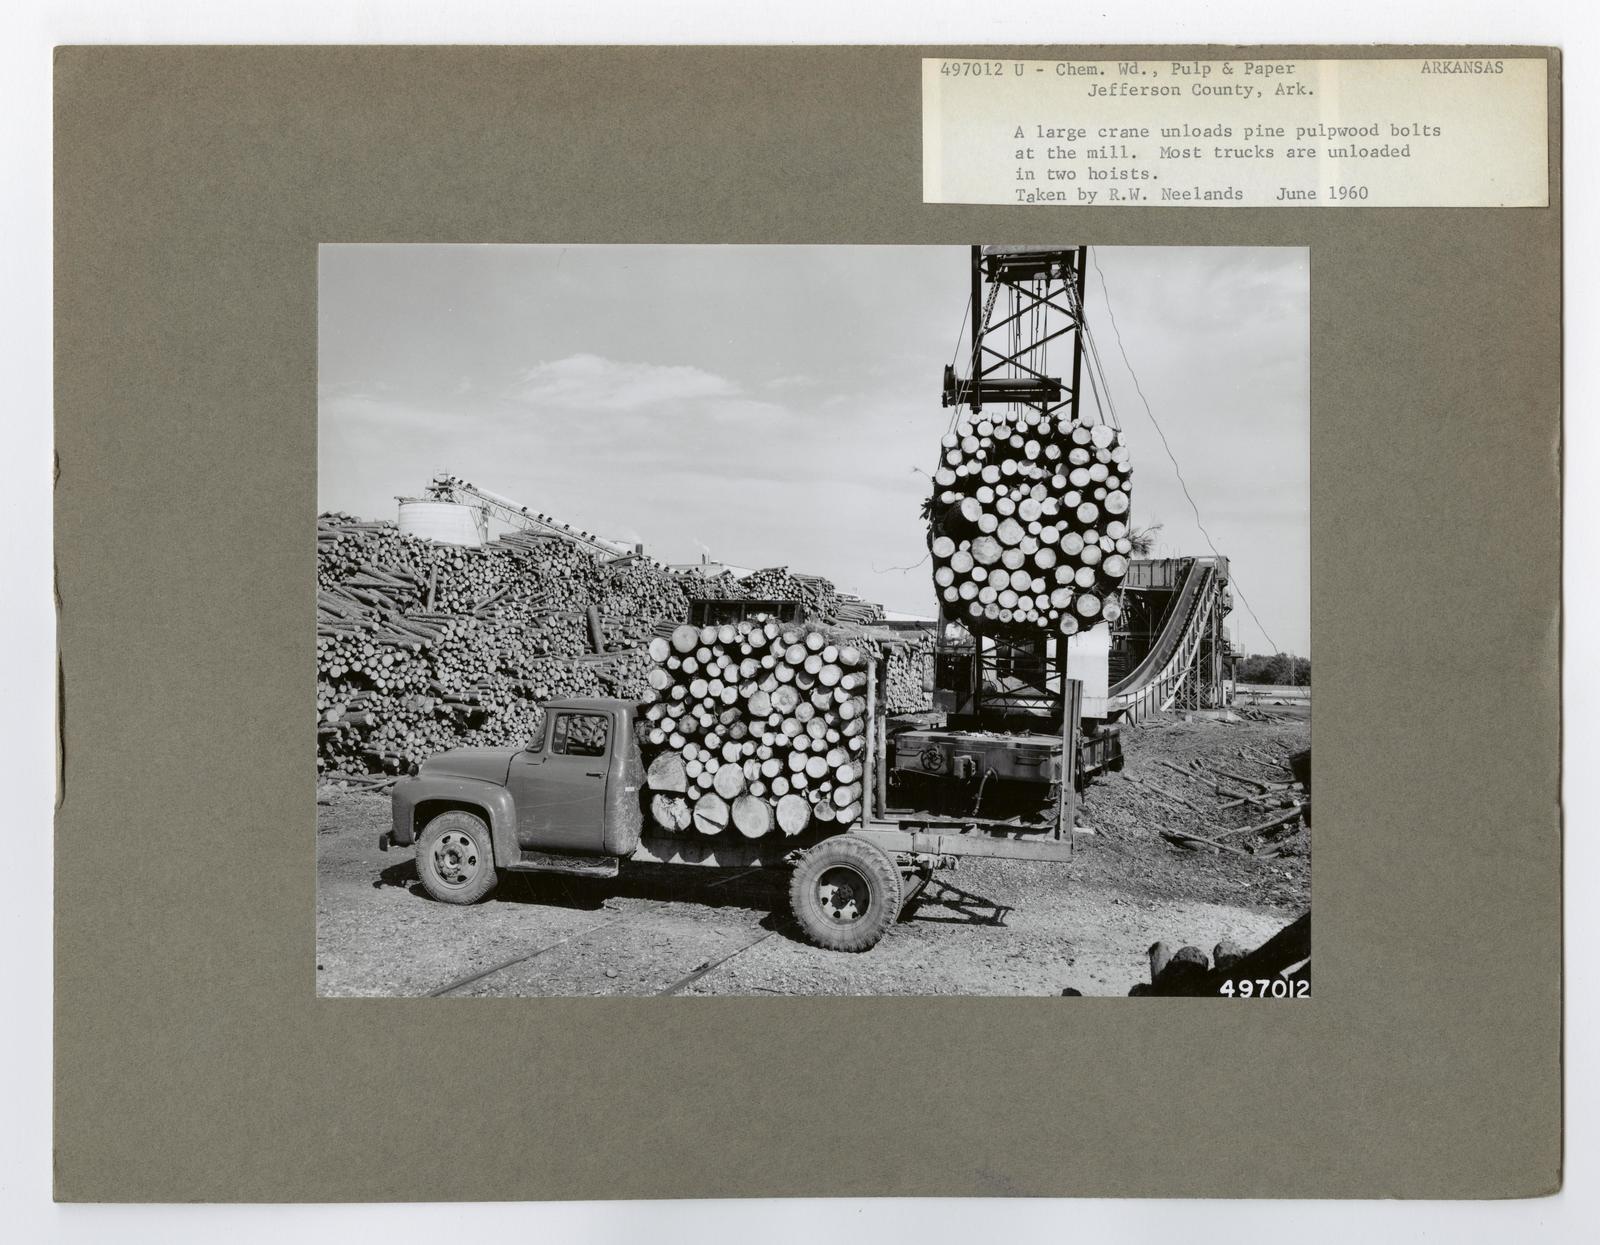 Pulp and Paper: Pulpwood Yards - Arkansas